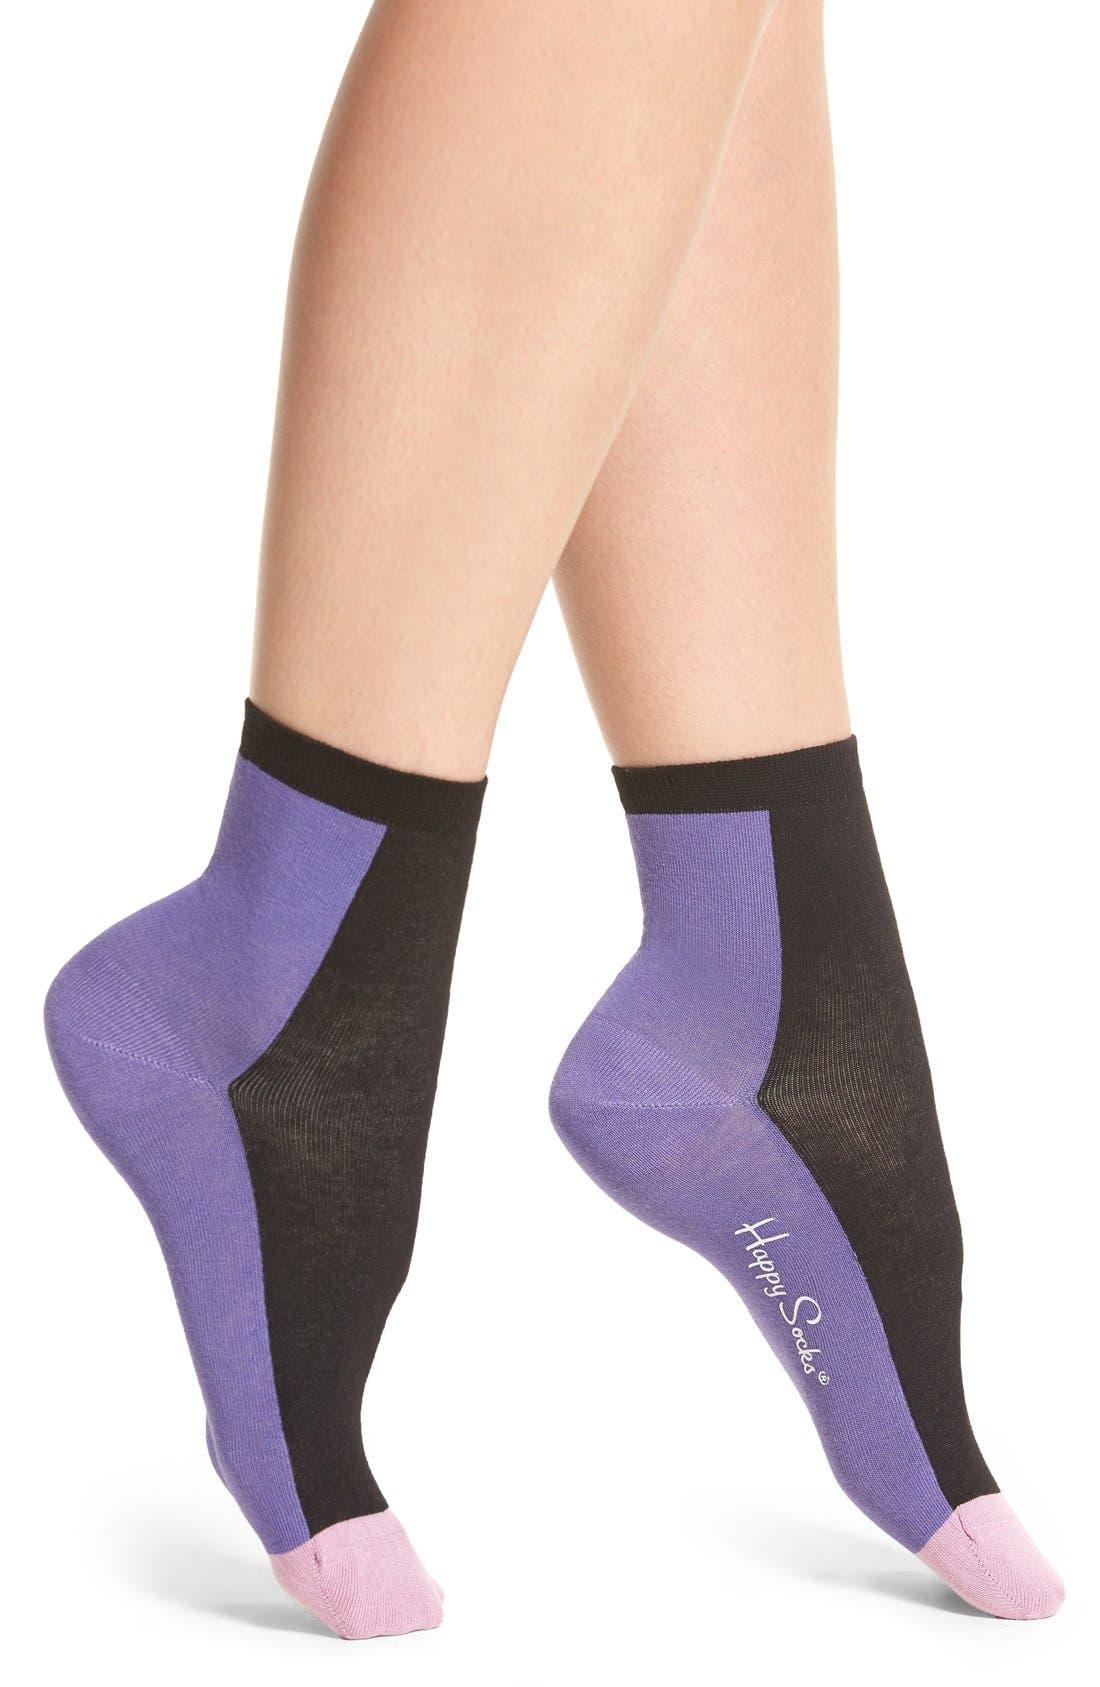 Anklet Socks,                             Main thumbnail 1, color,                             015